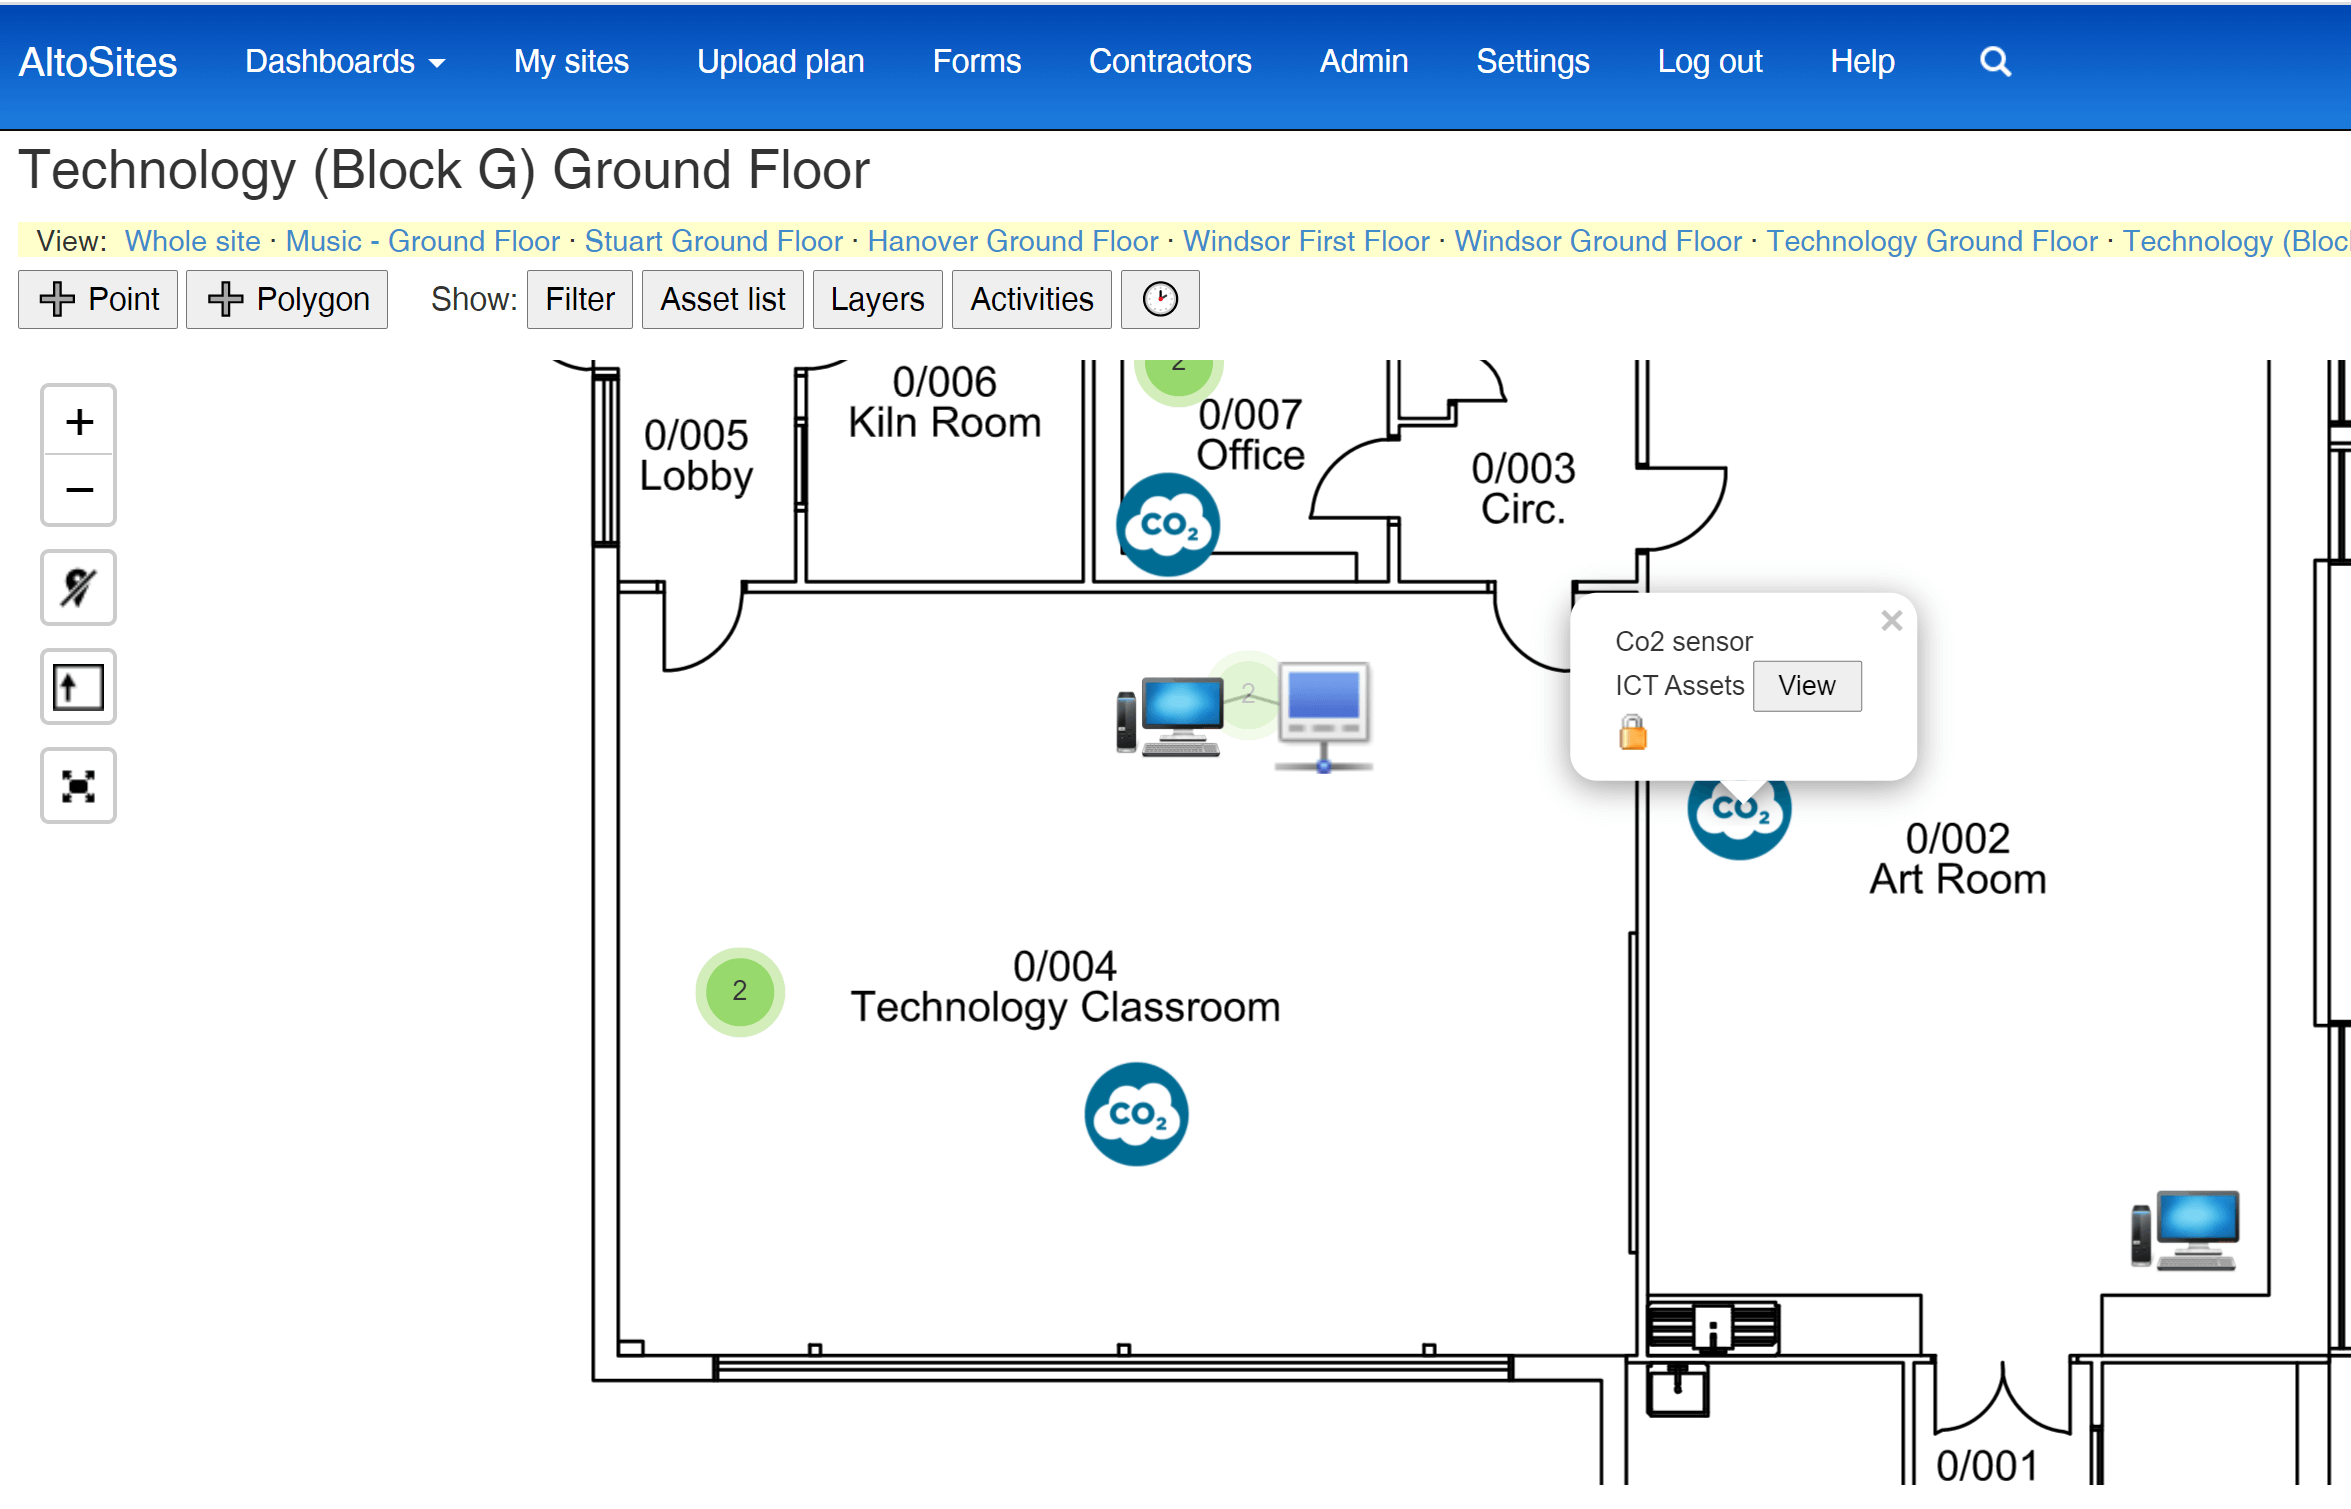 Locating CO2 monitors on floor plans